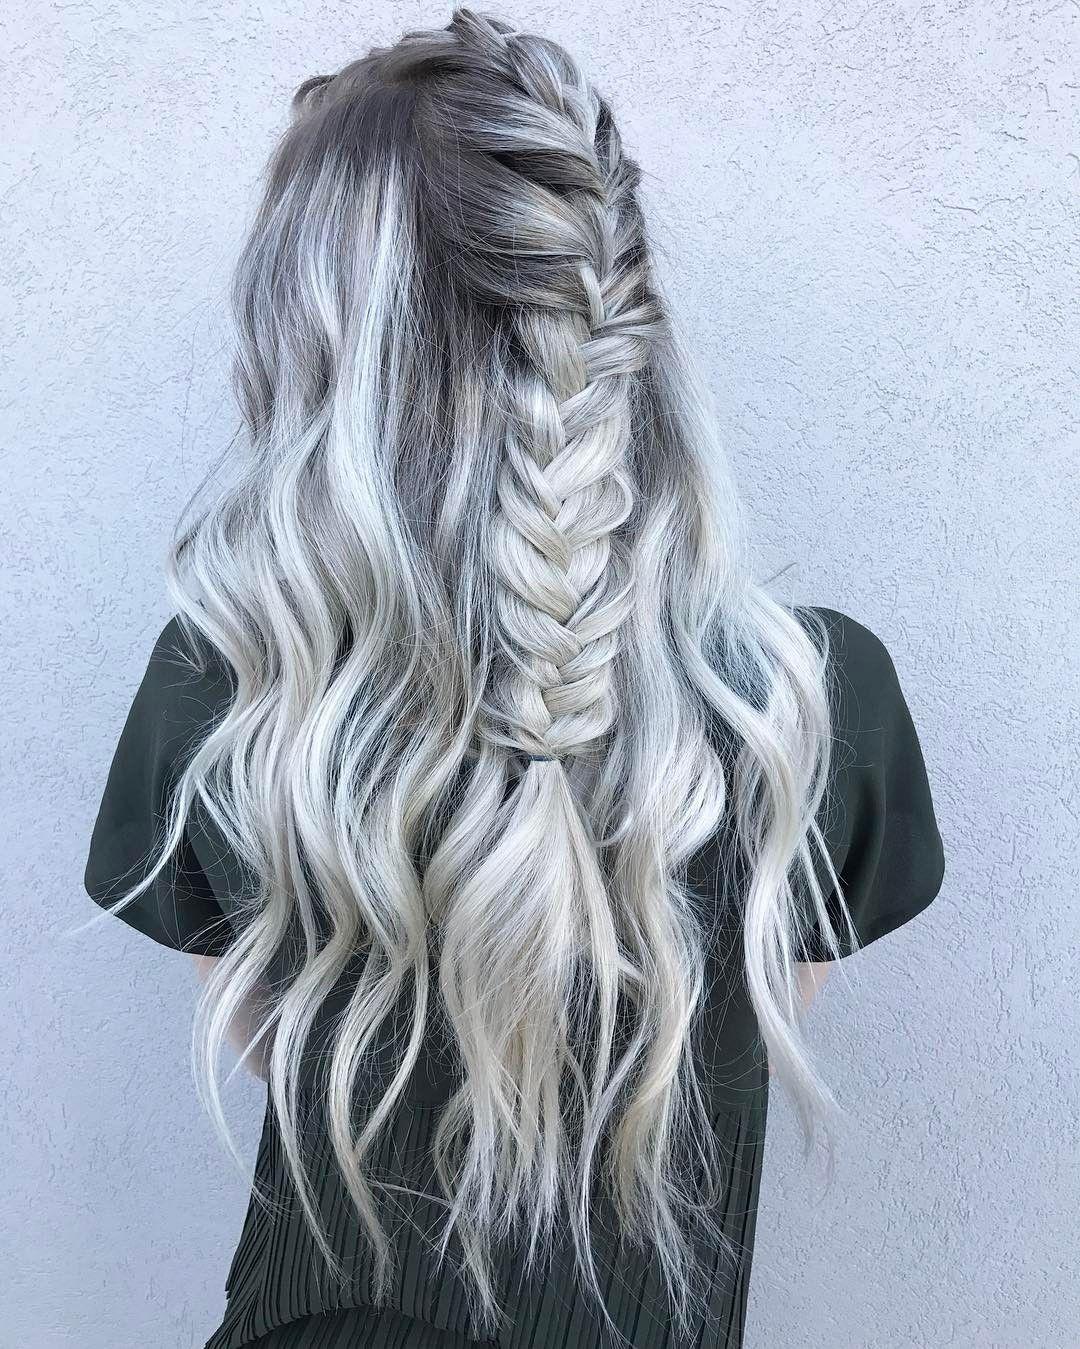 "598 Likes, 14 Comments - •Kathy Nunez• (@hairbykathynunez) on Instagram: ""Hair goals for days for the gorgeous @heidirus ✨Color by me, Braided by @rachelstudioonesalons ✨…"""